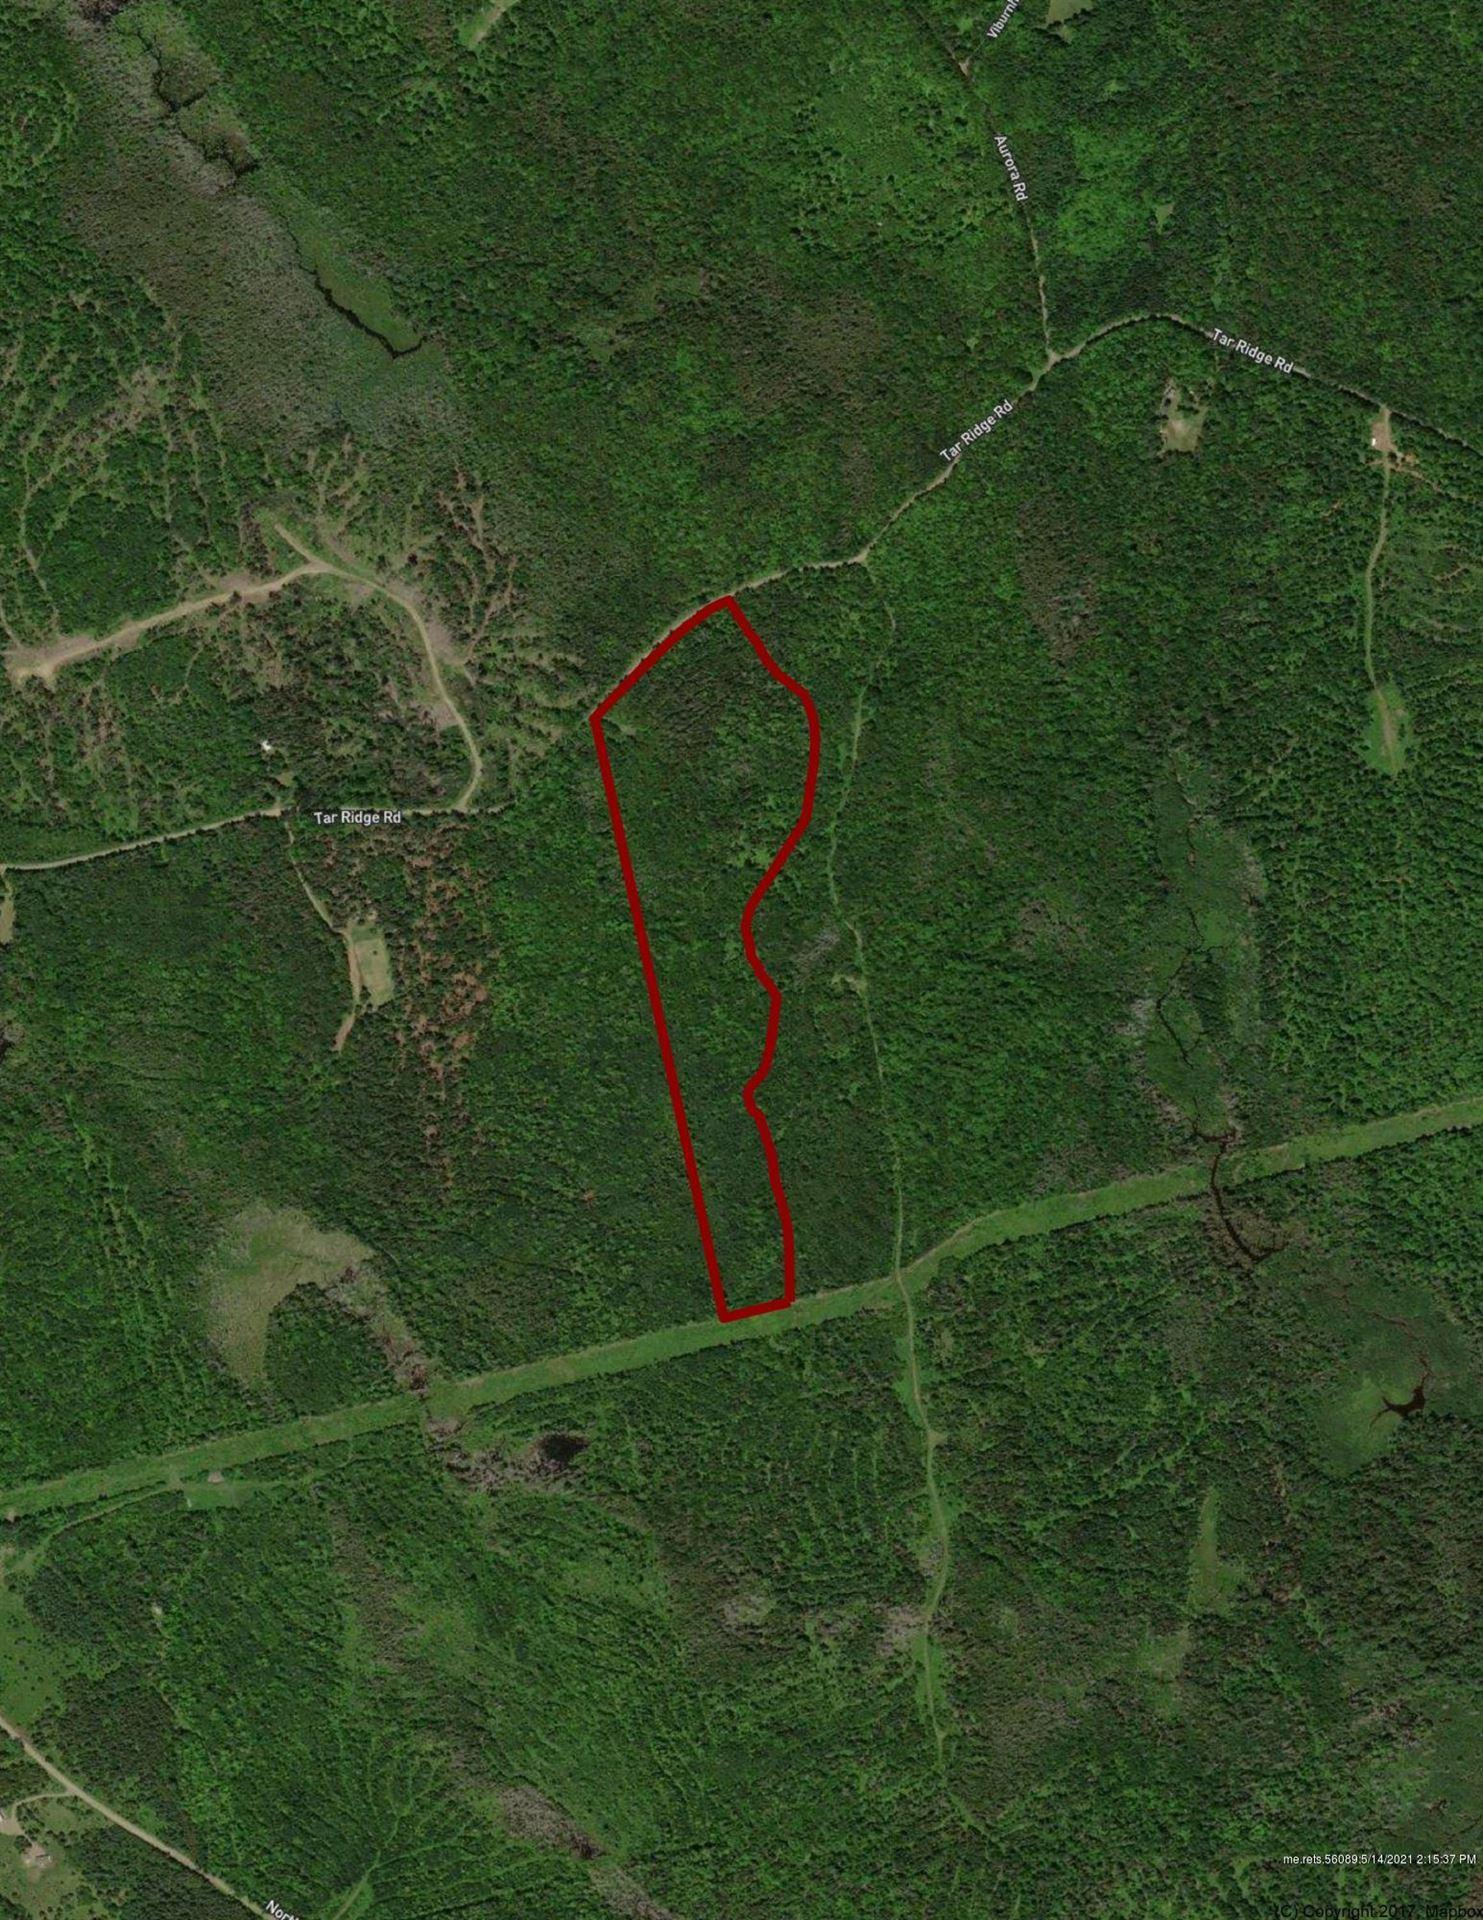 Photo of Lot 11.5 Off Tar Ridge Road, Prentiss Township T7 R3 NBPP, ME 04487 (MLS # 1491601)